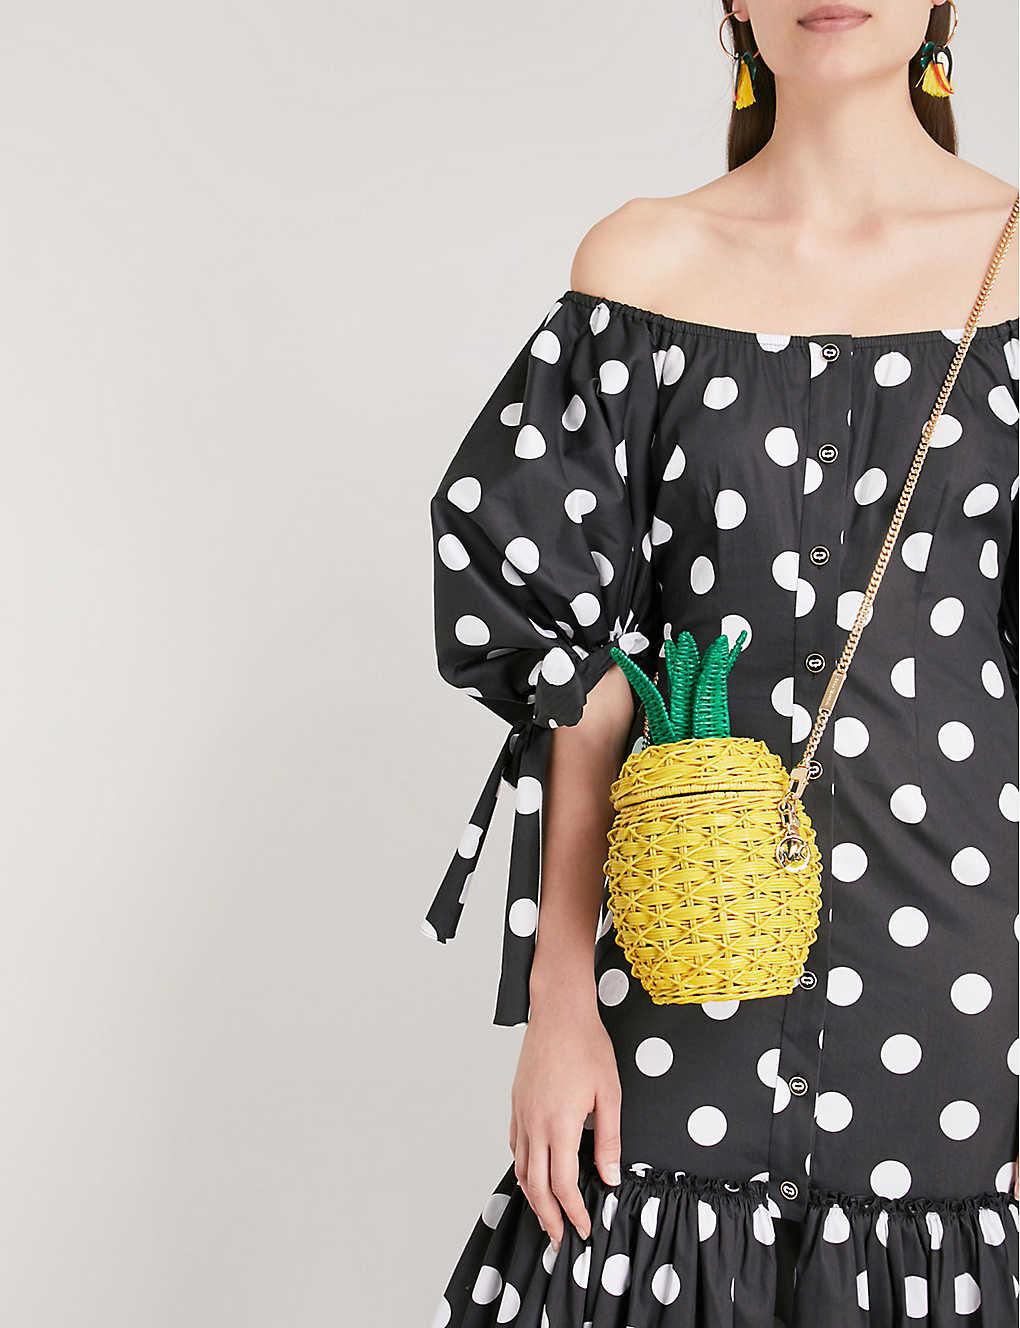 043b3200b079 MICHAEL MICHAEL KORS - Pineapple wicker and leather crossbody bag ...